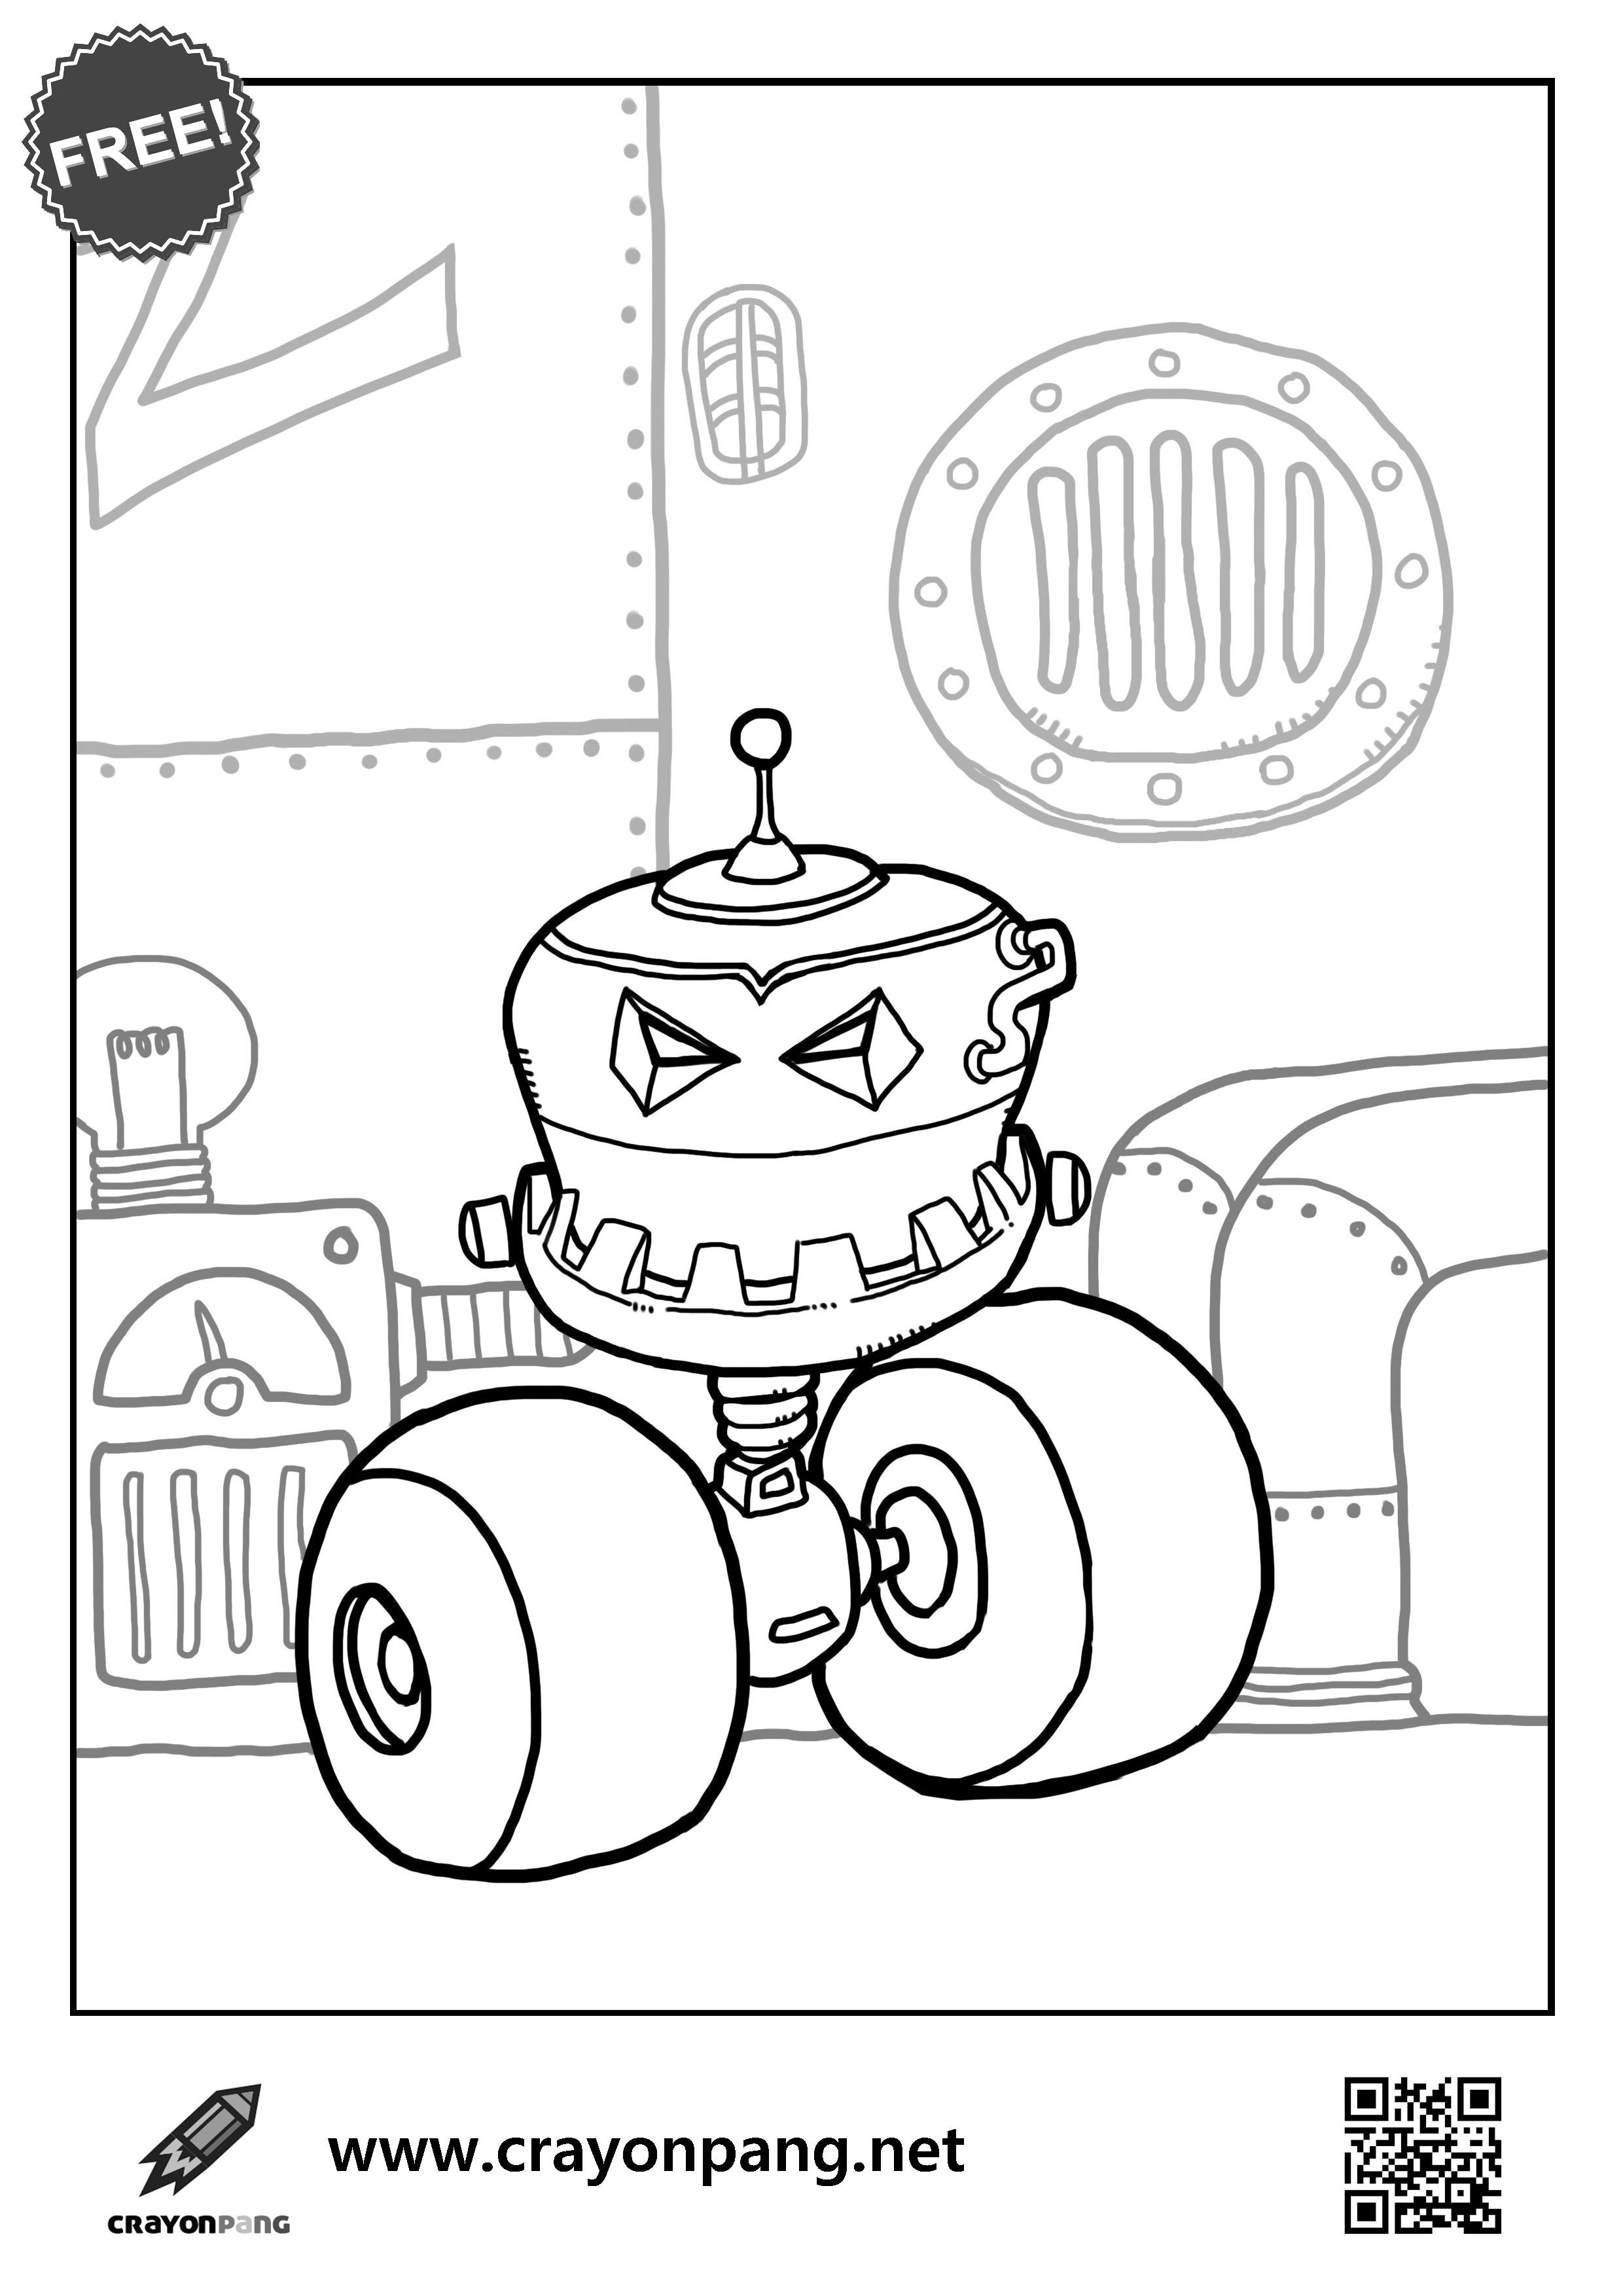 _è·Ö≥_Ö·Ö¶_ã·Ö≠_º·Ñë_°·Üº_é·Öµ_´·___07_Pumpkinbot_Halo